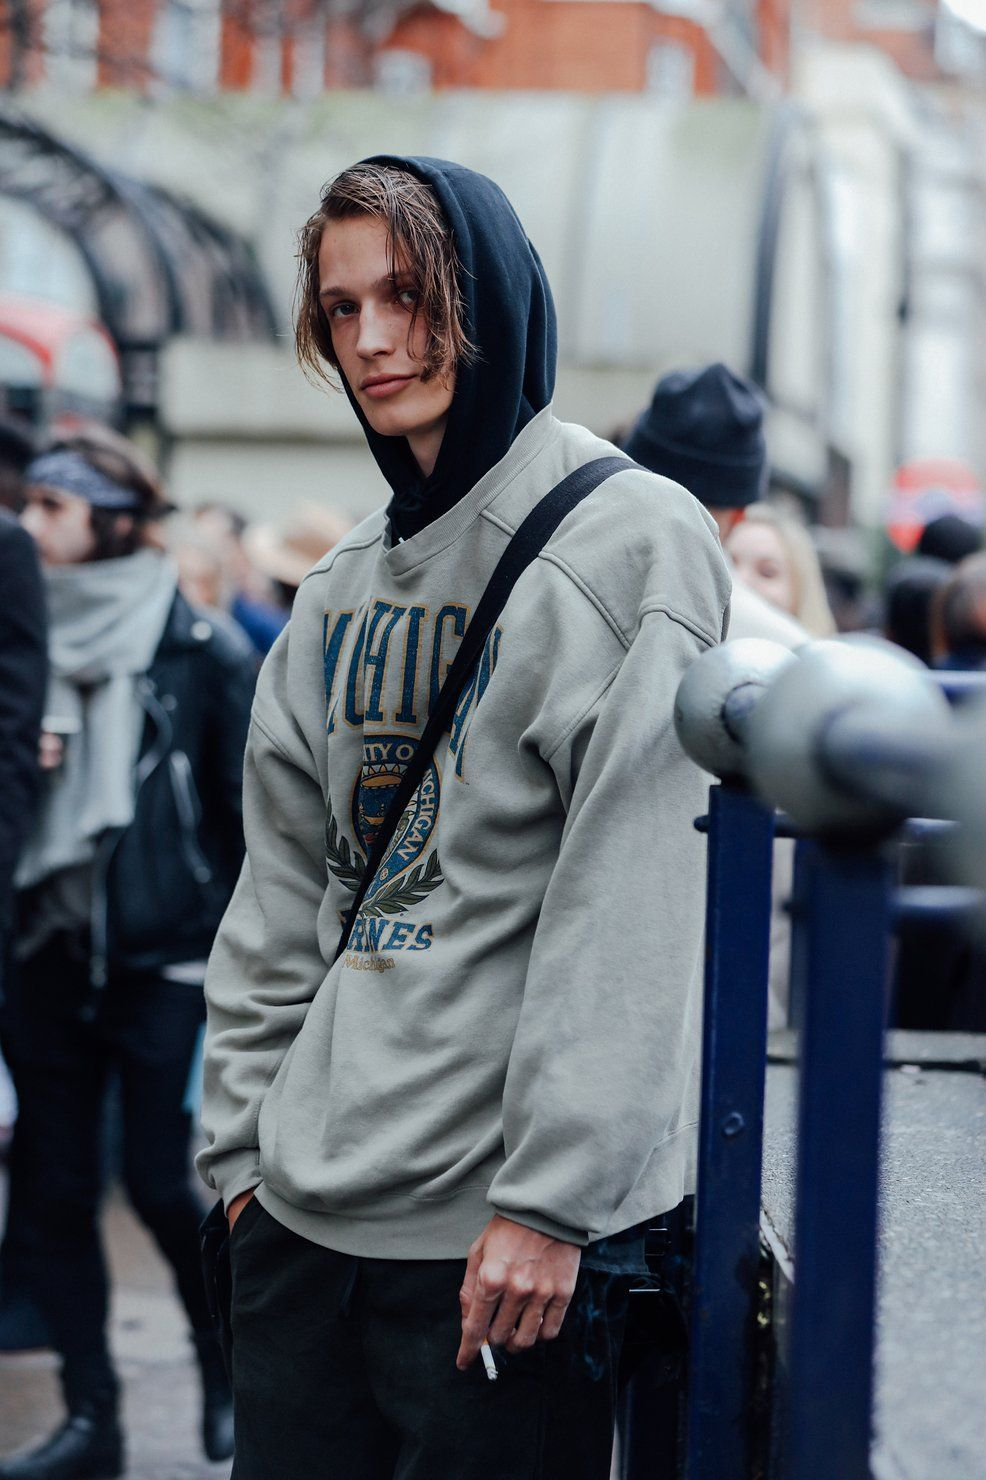 idées inspiration blogger automne hiver #lifestyle #fashion #mode #trendy @bebadass @blog @inspiration #trendystreetstyle